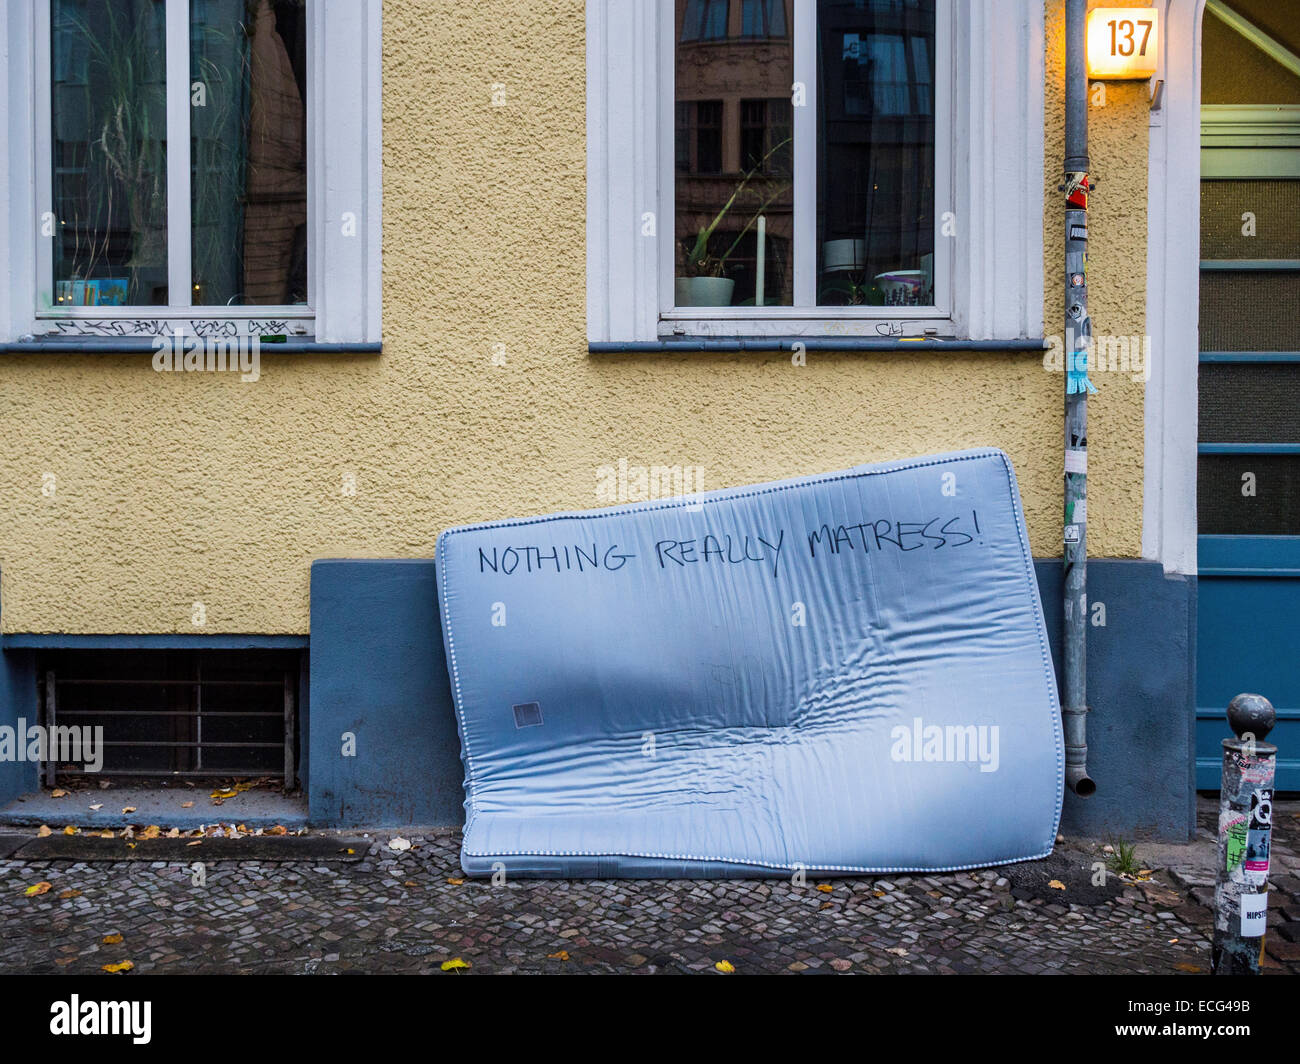 mattress-dumped-outside-house-on-a-pavem